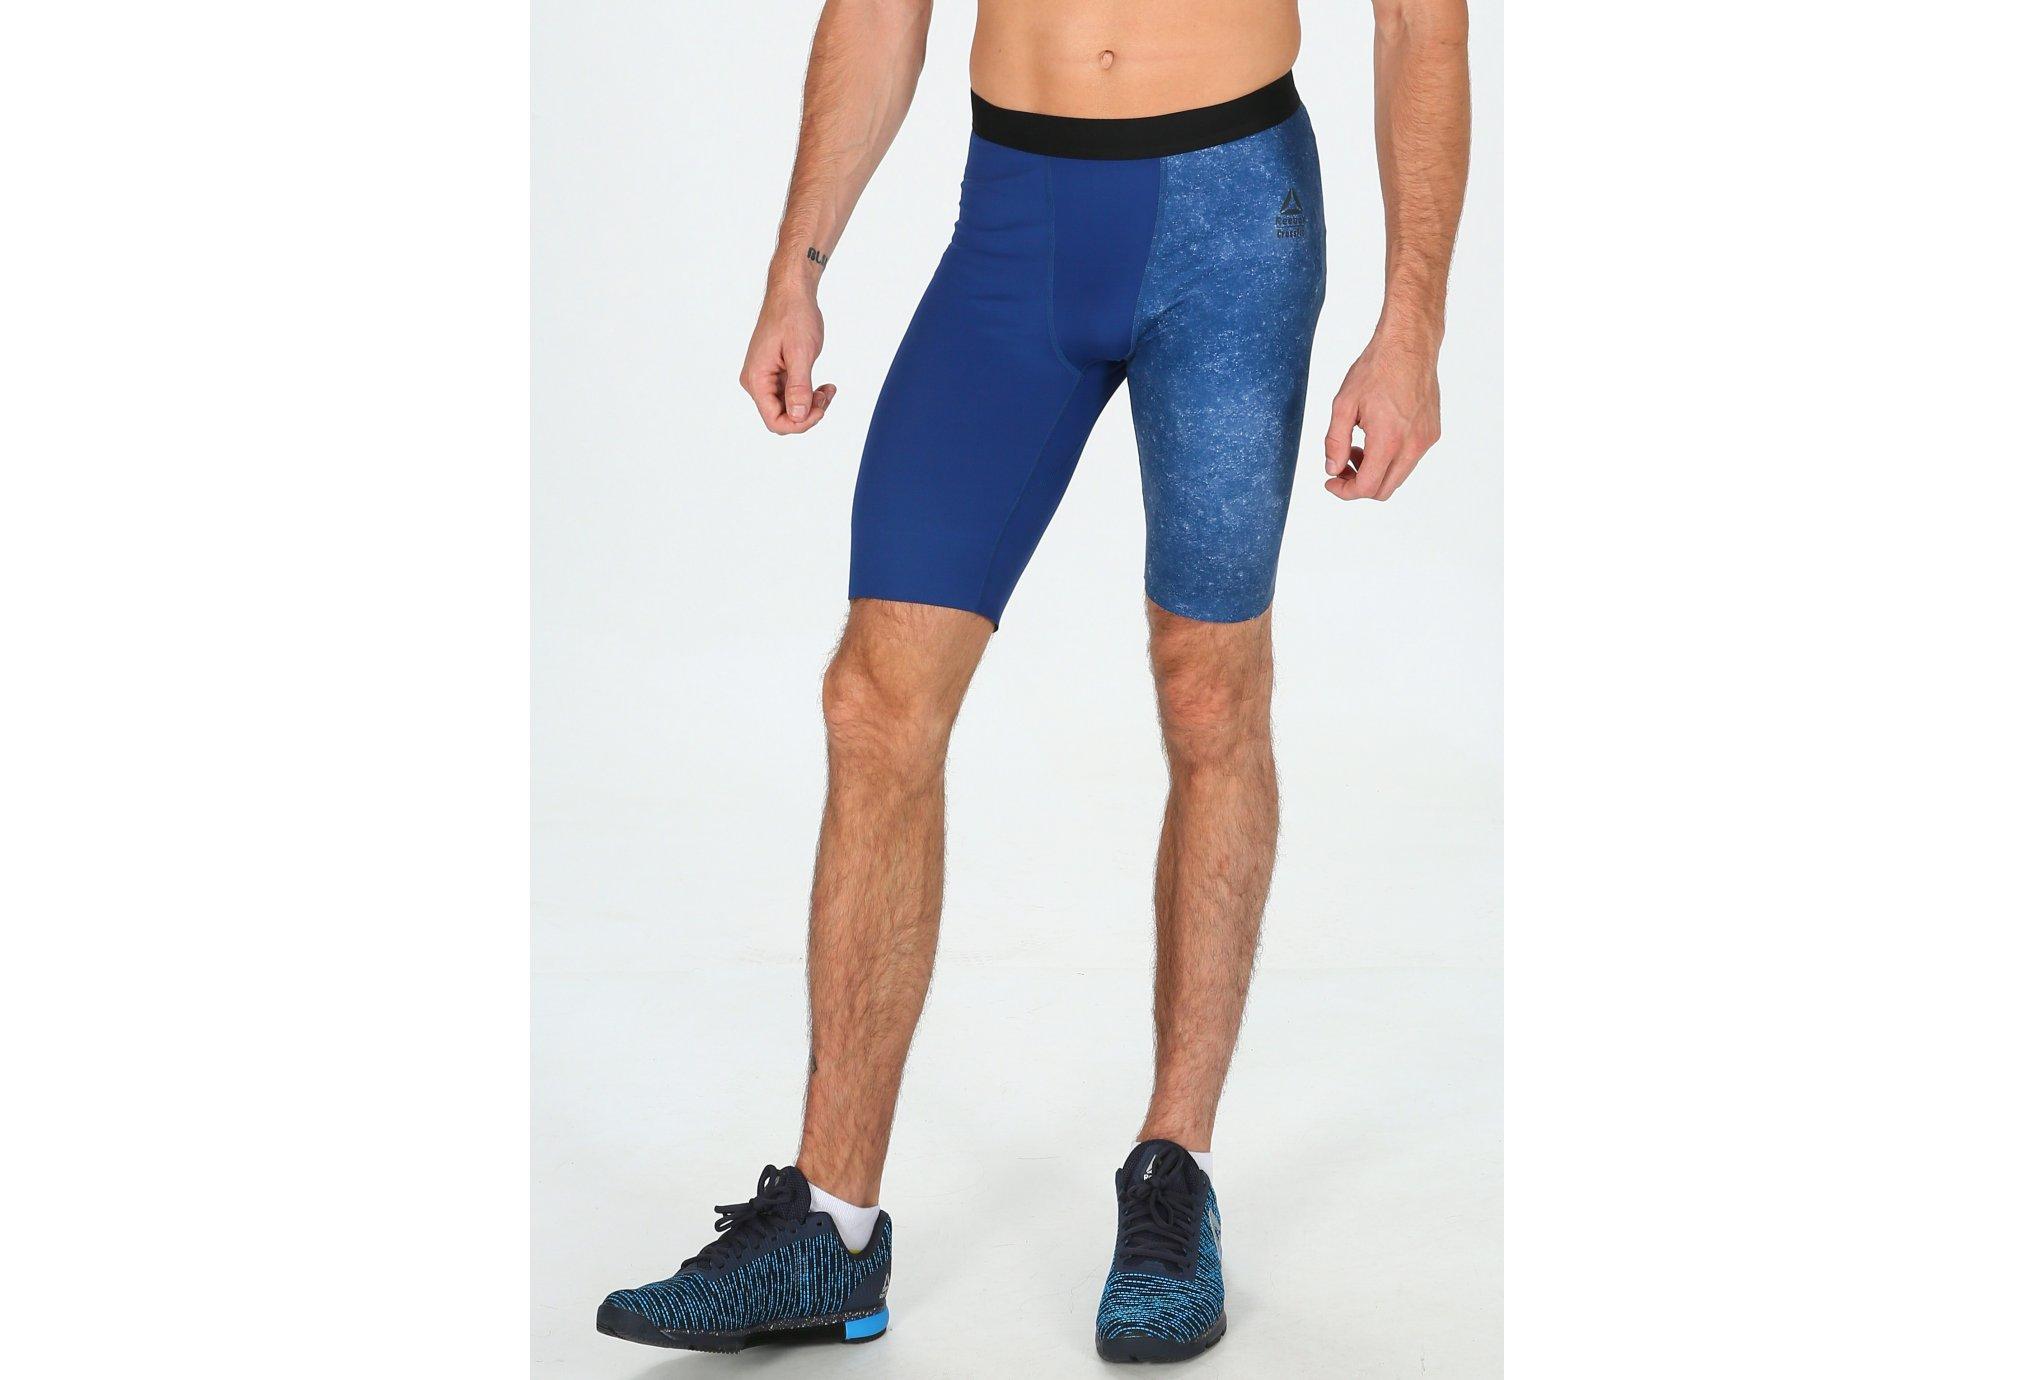 Reebok Mallas cortas Compression CrossFit vêtement running homme